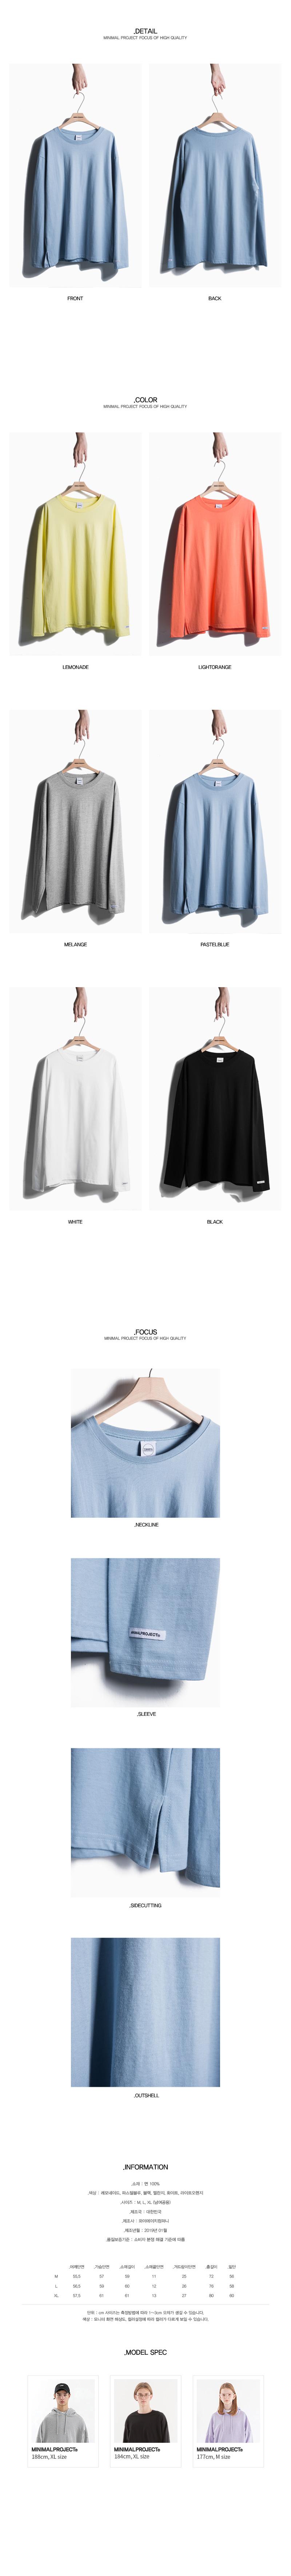 [minimal project] 미니멀 프로젝트 오버핏 롱 슬리브 티셔츠 MLT101 / 6color